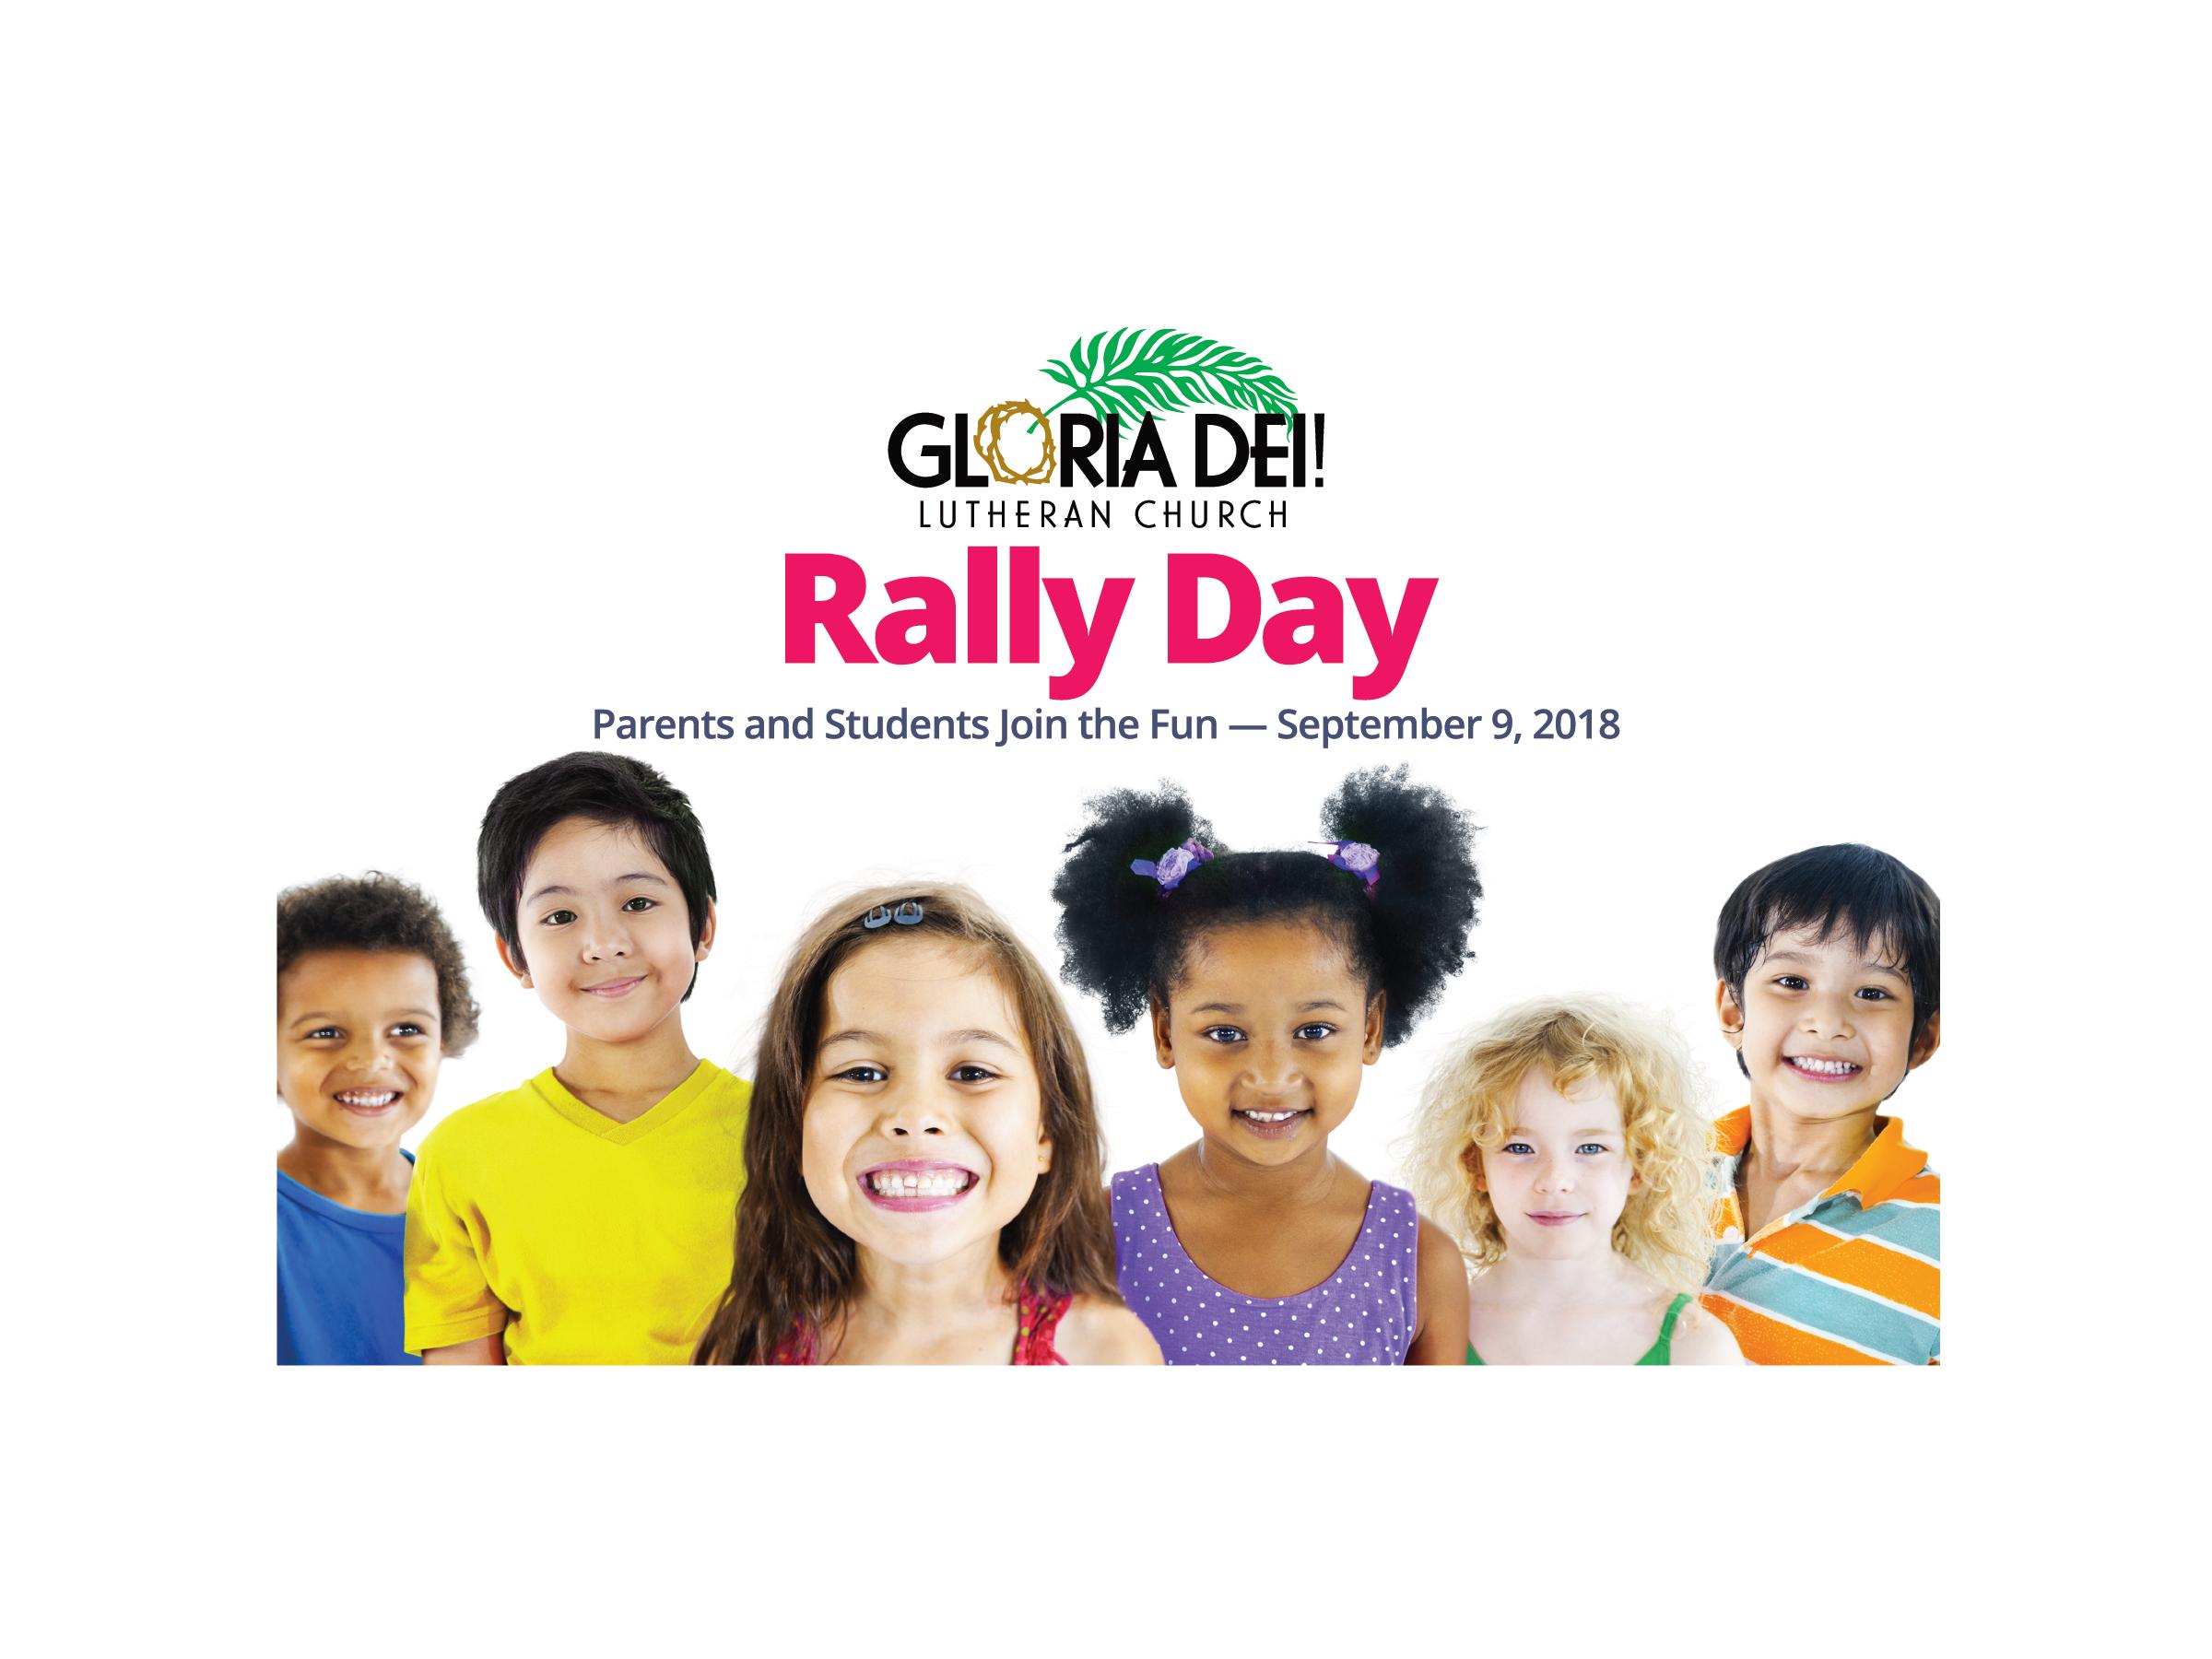 Gloria Dei Rally Day Postcard Front